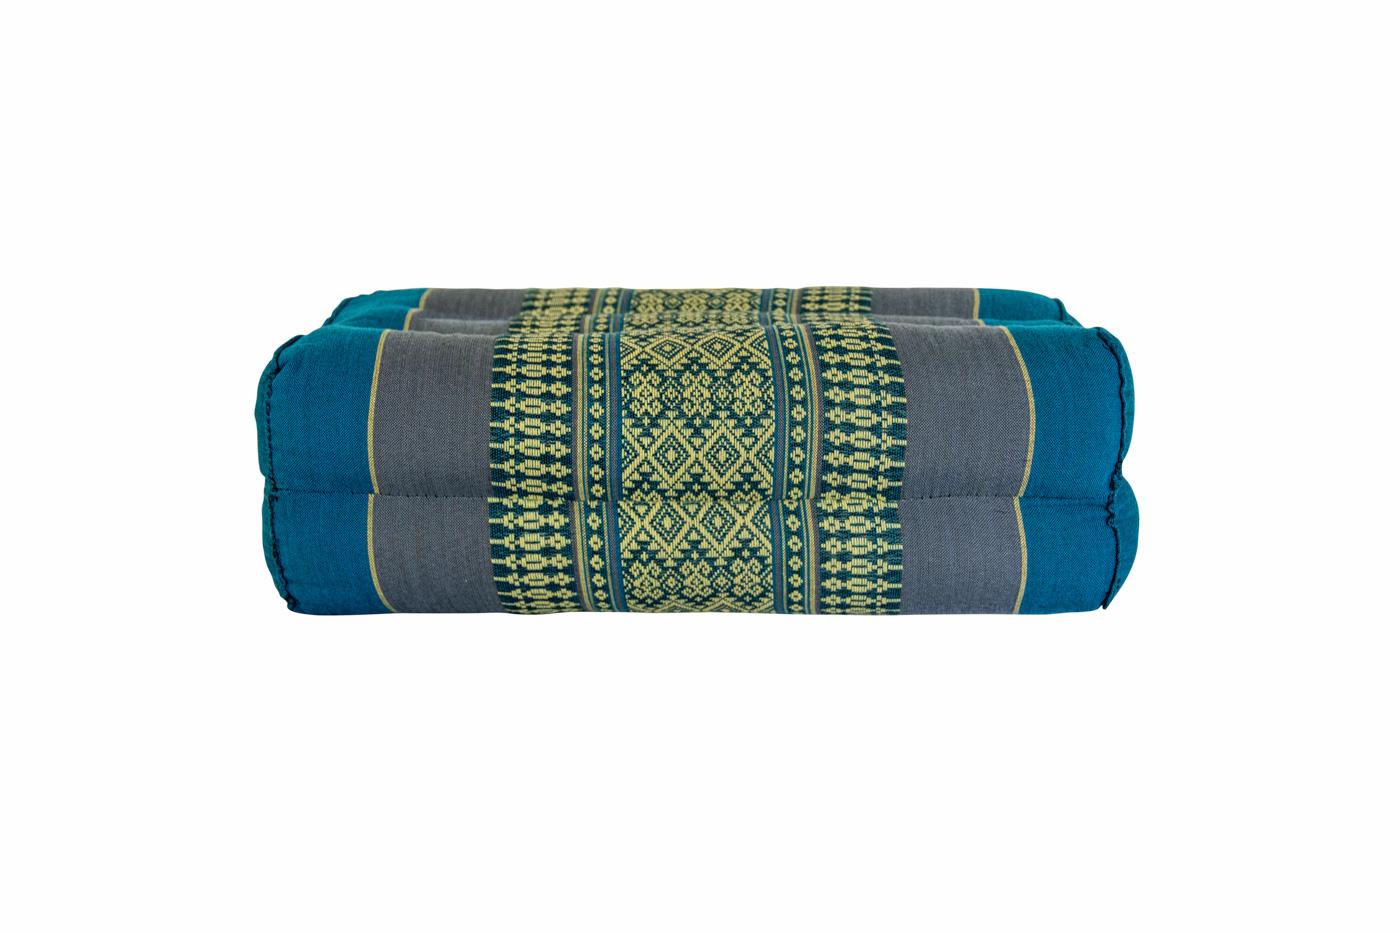 Rectangular meditation cushion